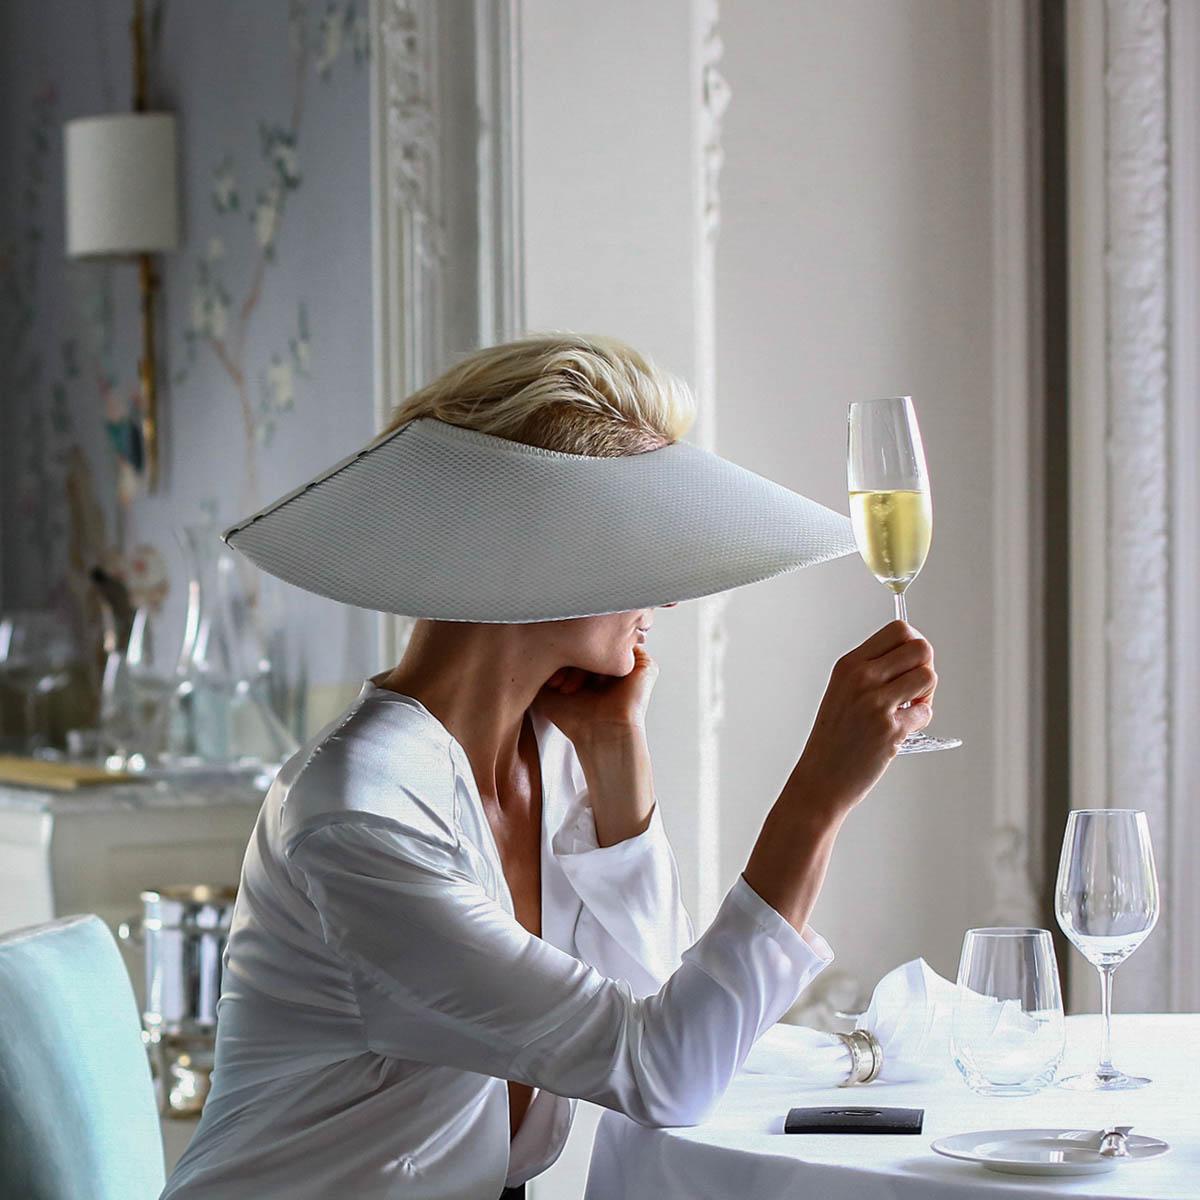 hilton-champagne-dame-chic